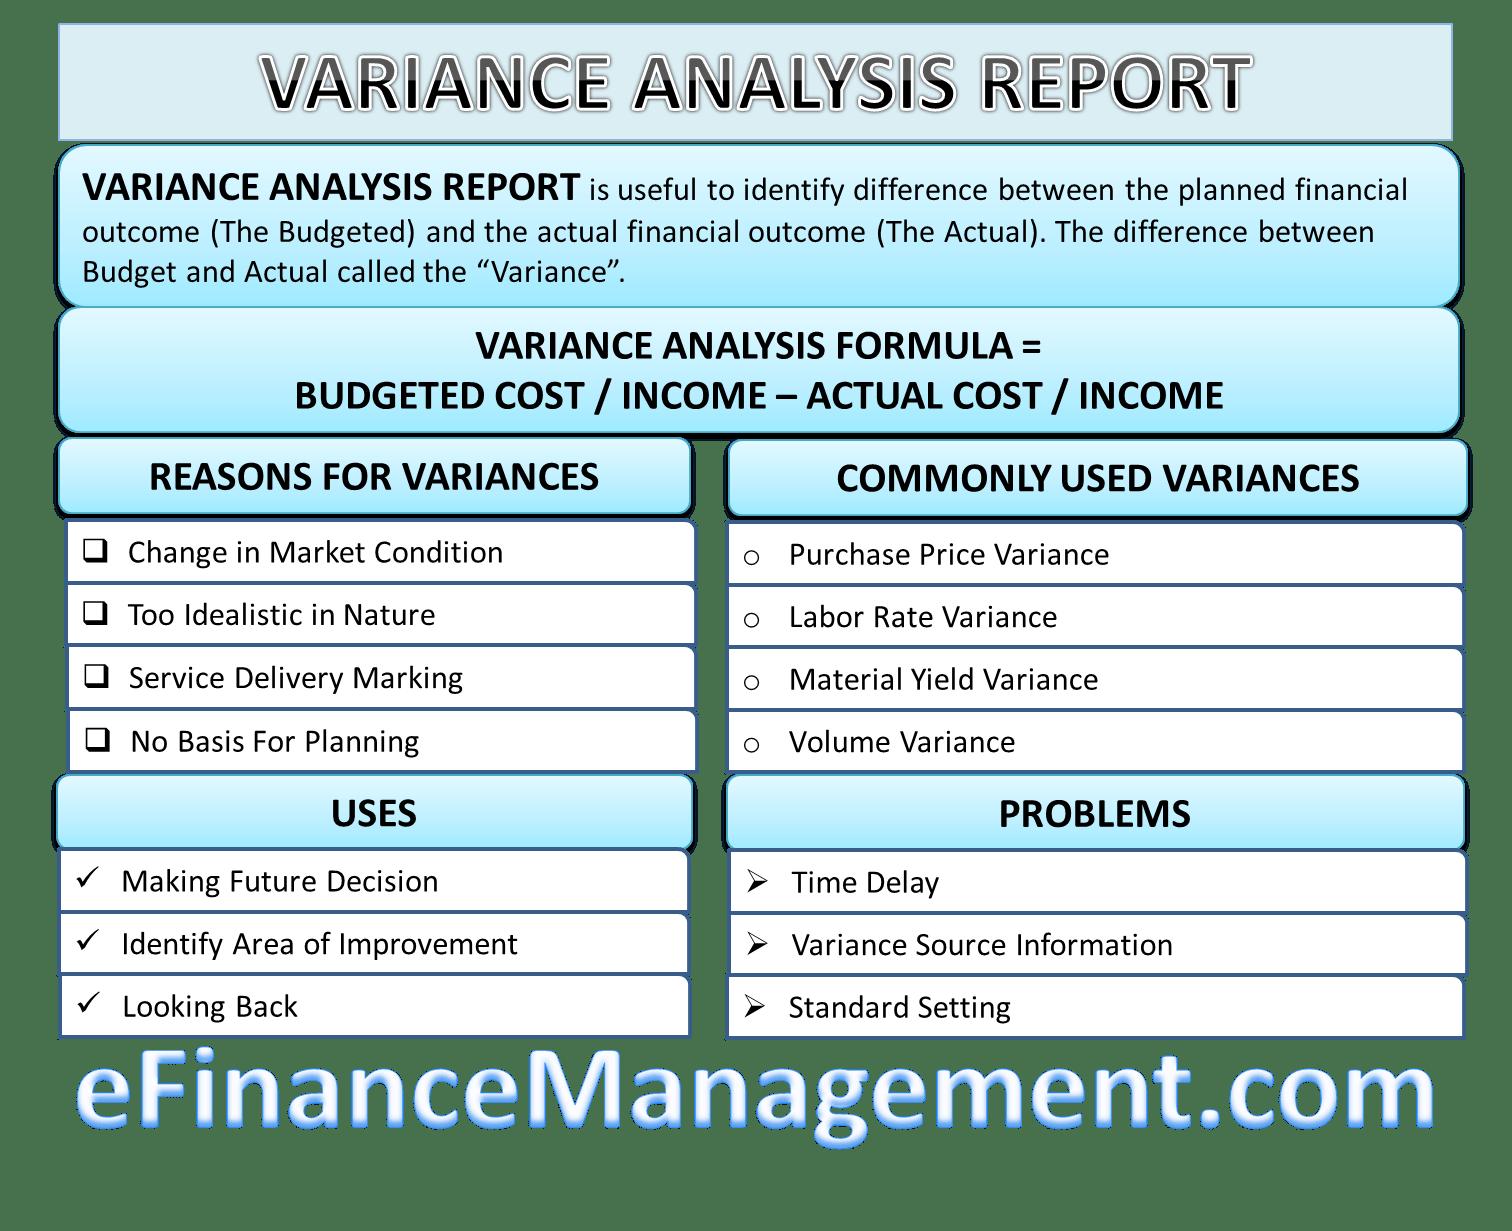 Variance Analysis Report